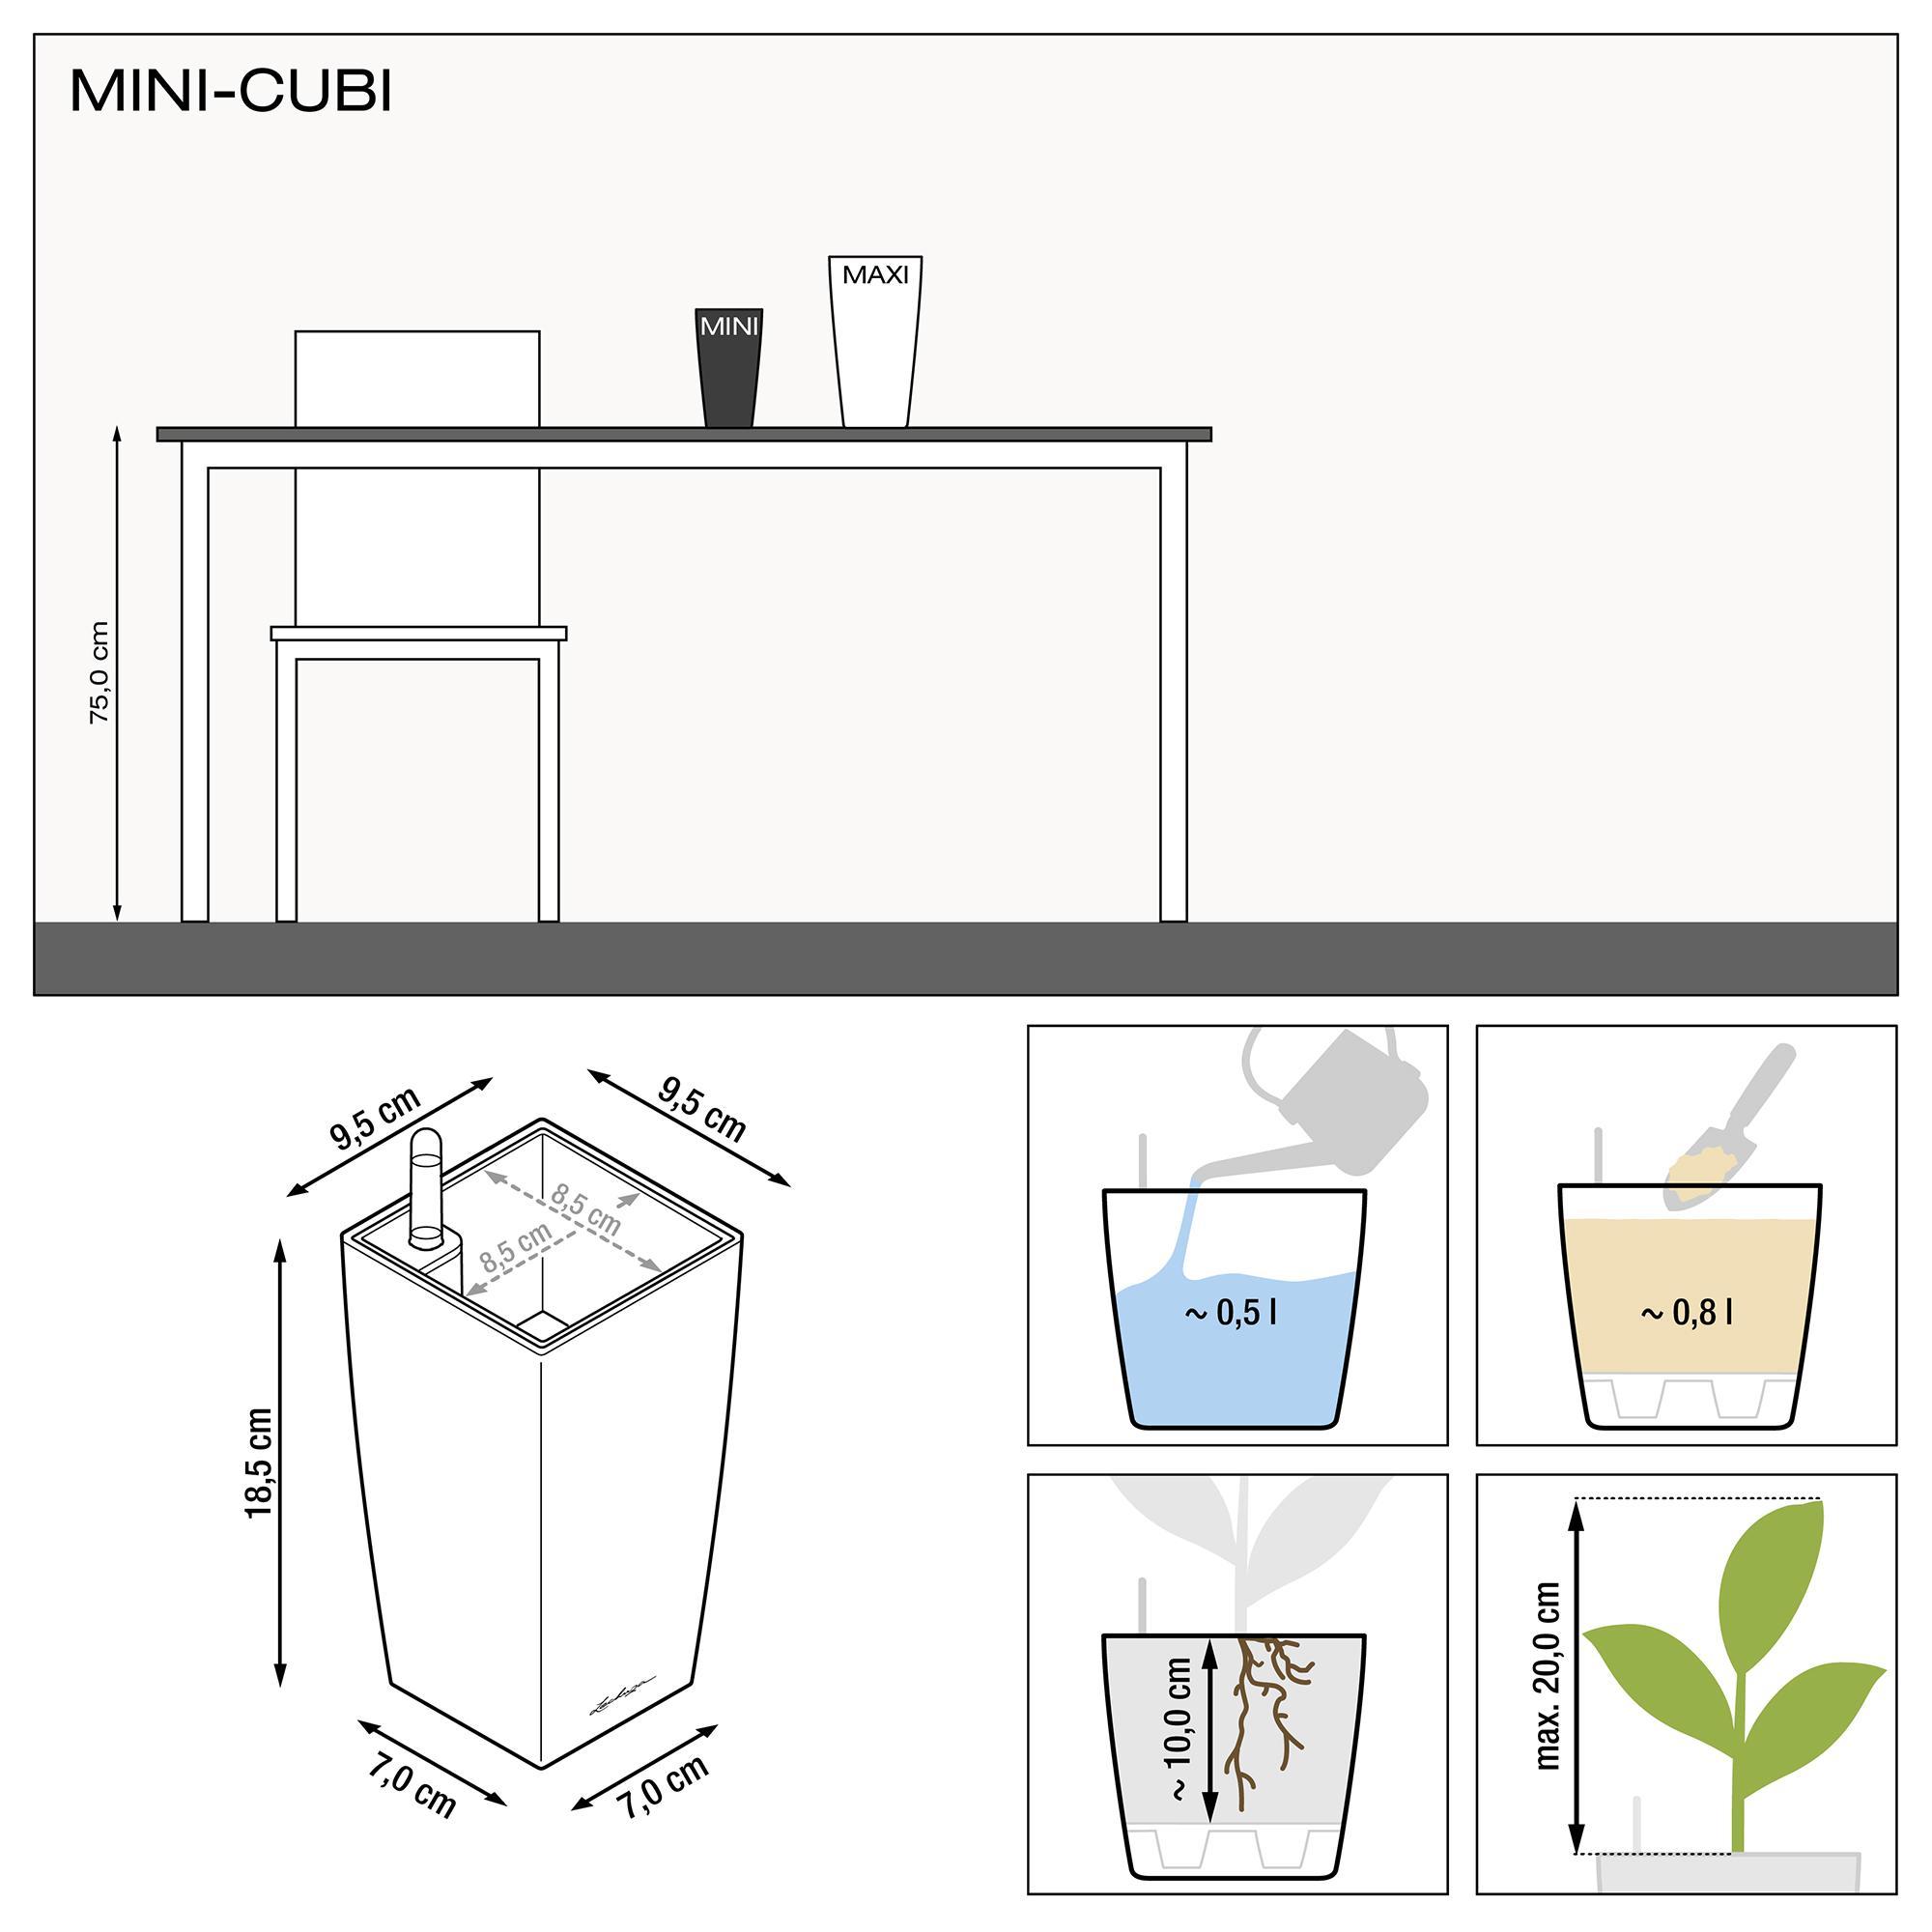 MINI-CUBI white high-gloss - Image 3